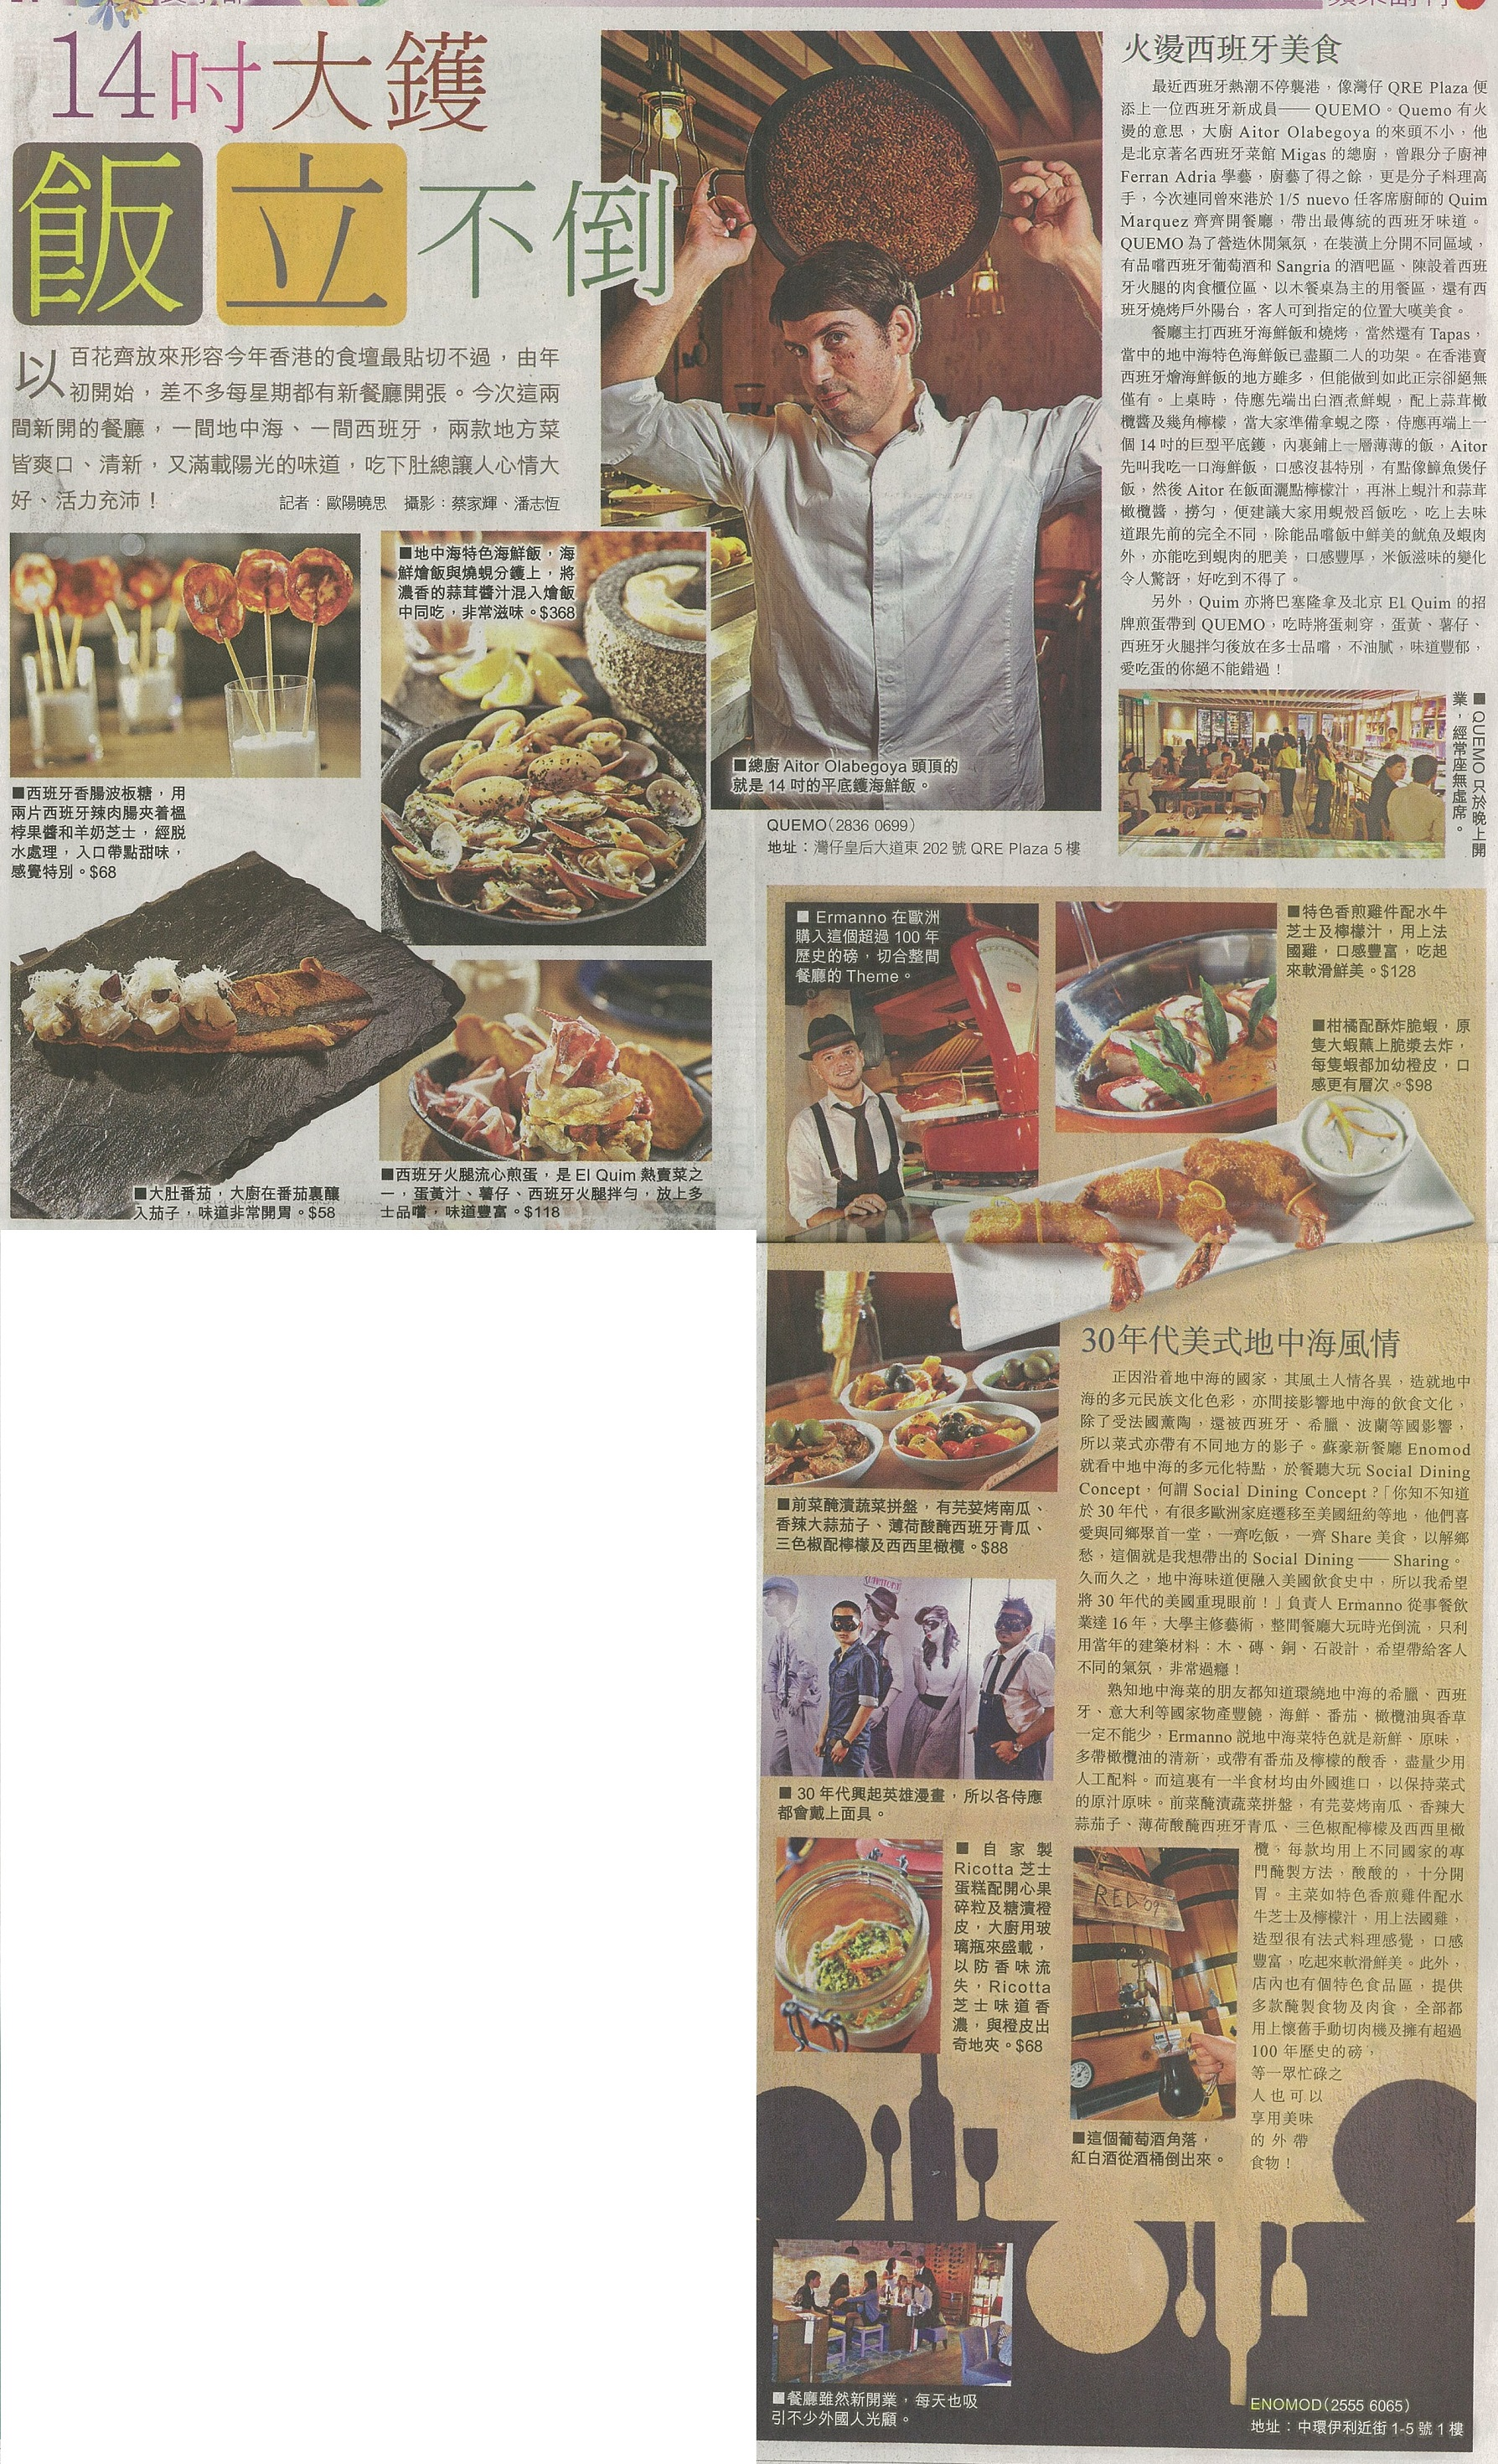 ENOMOD - 21.04 - Apple Daily (E4).jpg